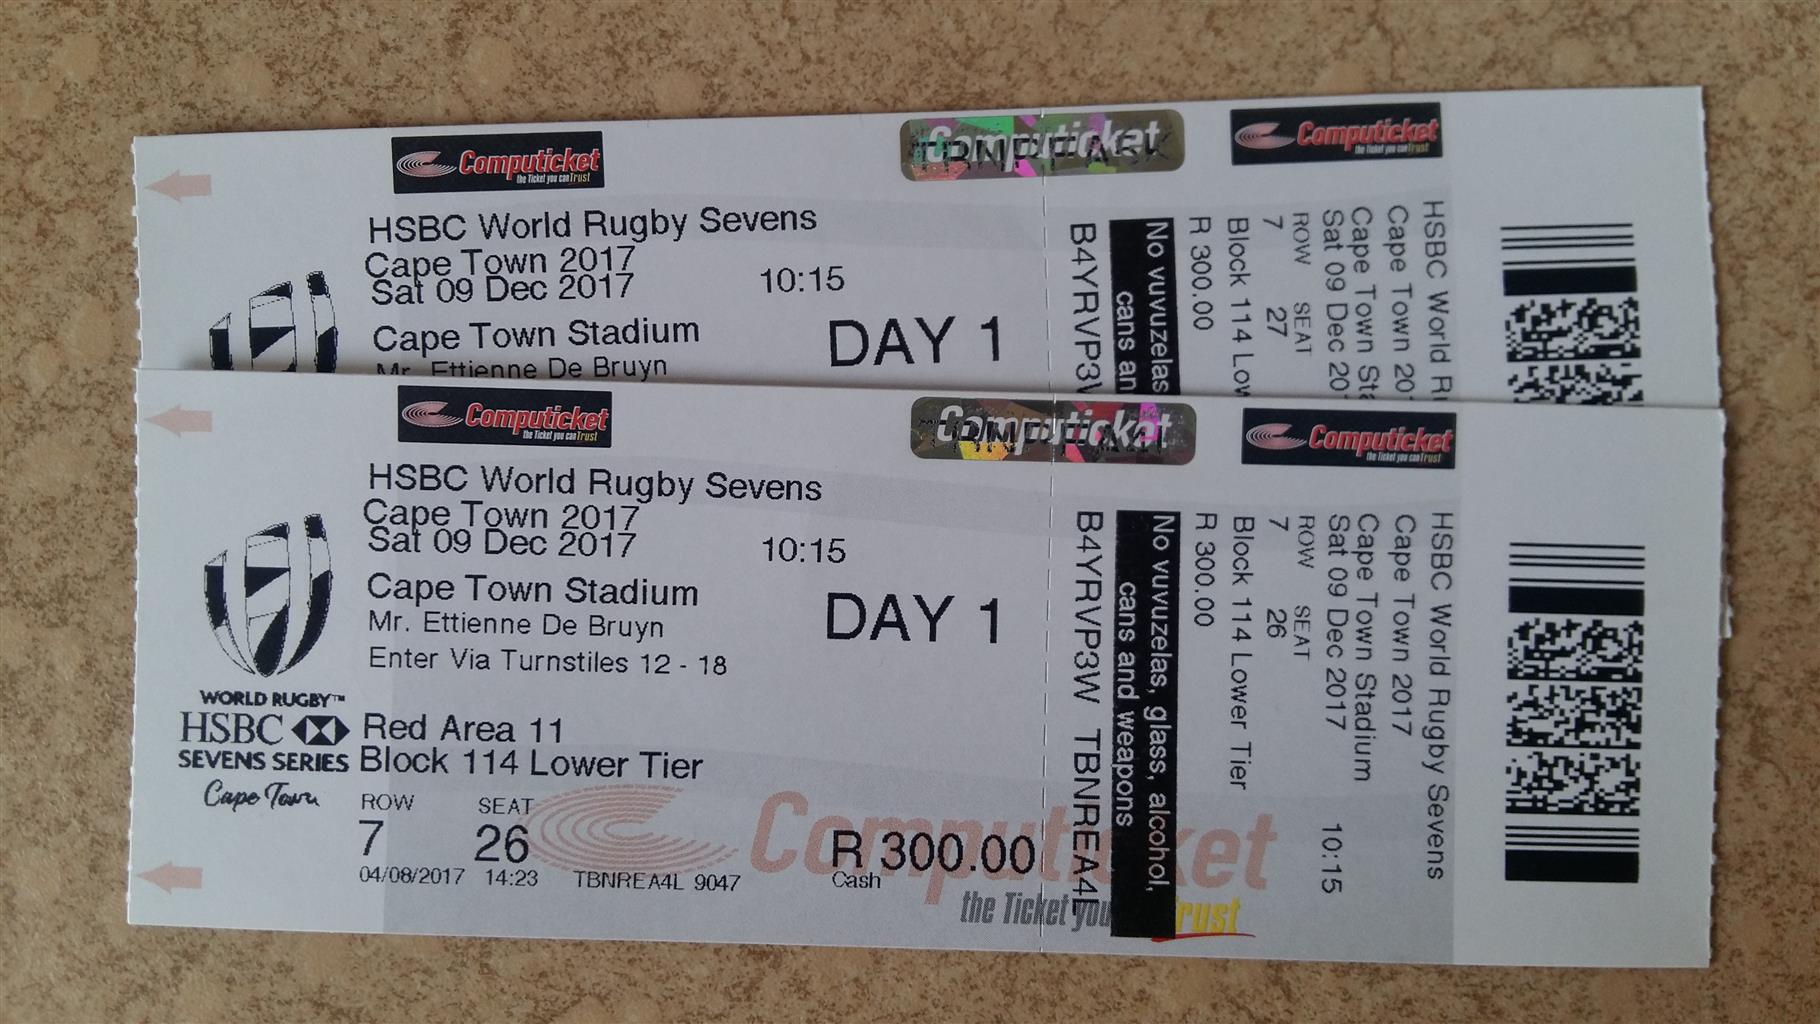 HSBC World Rugby Sevens tickets